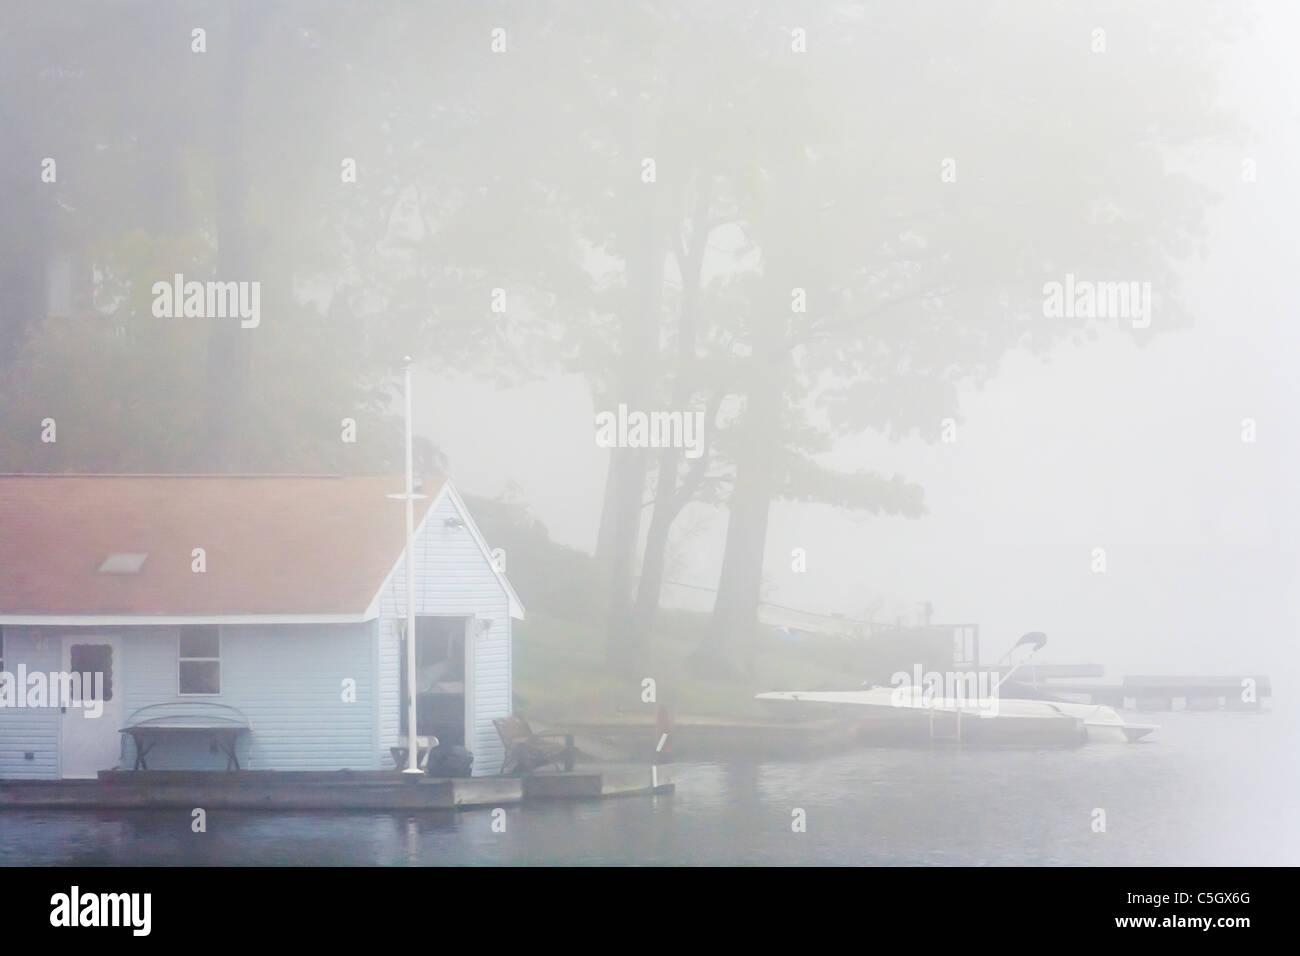 Heavy Fog on a lake. - Stock Image